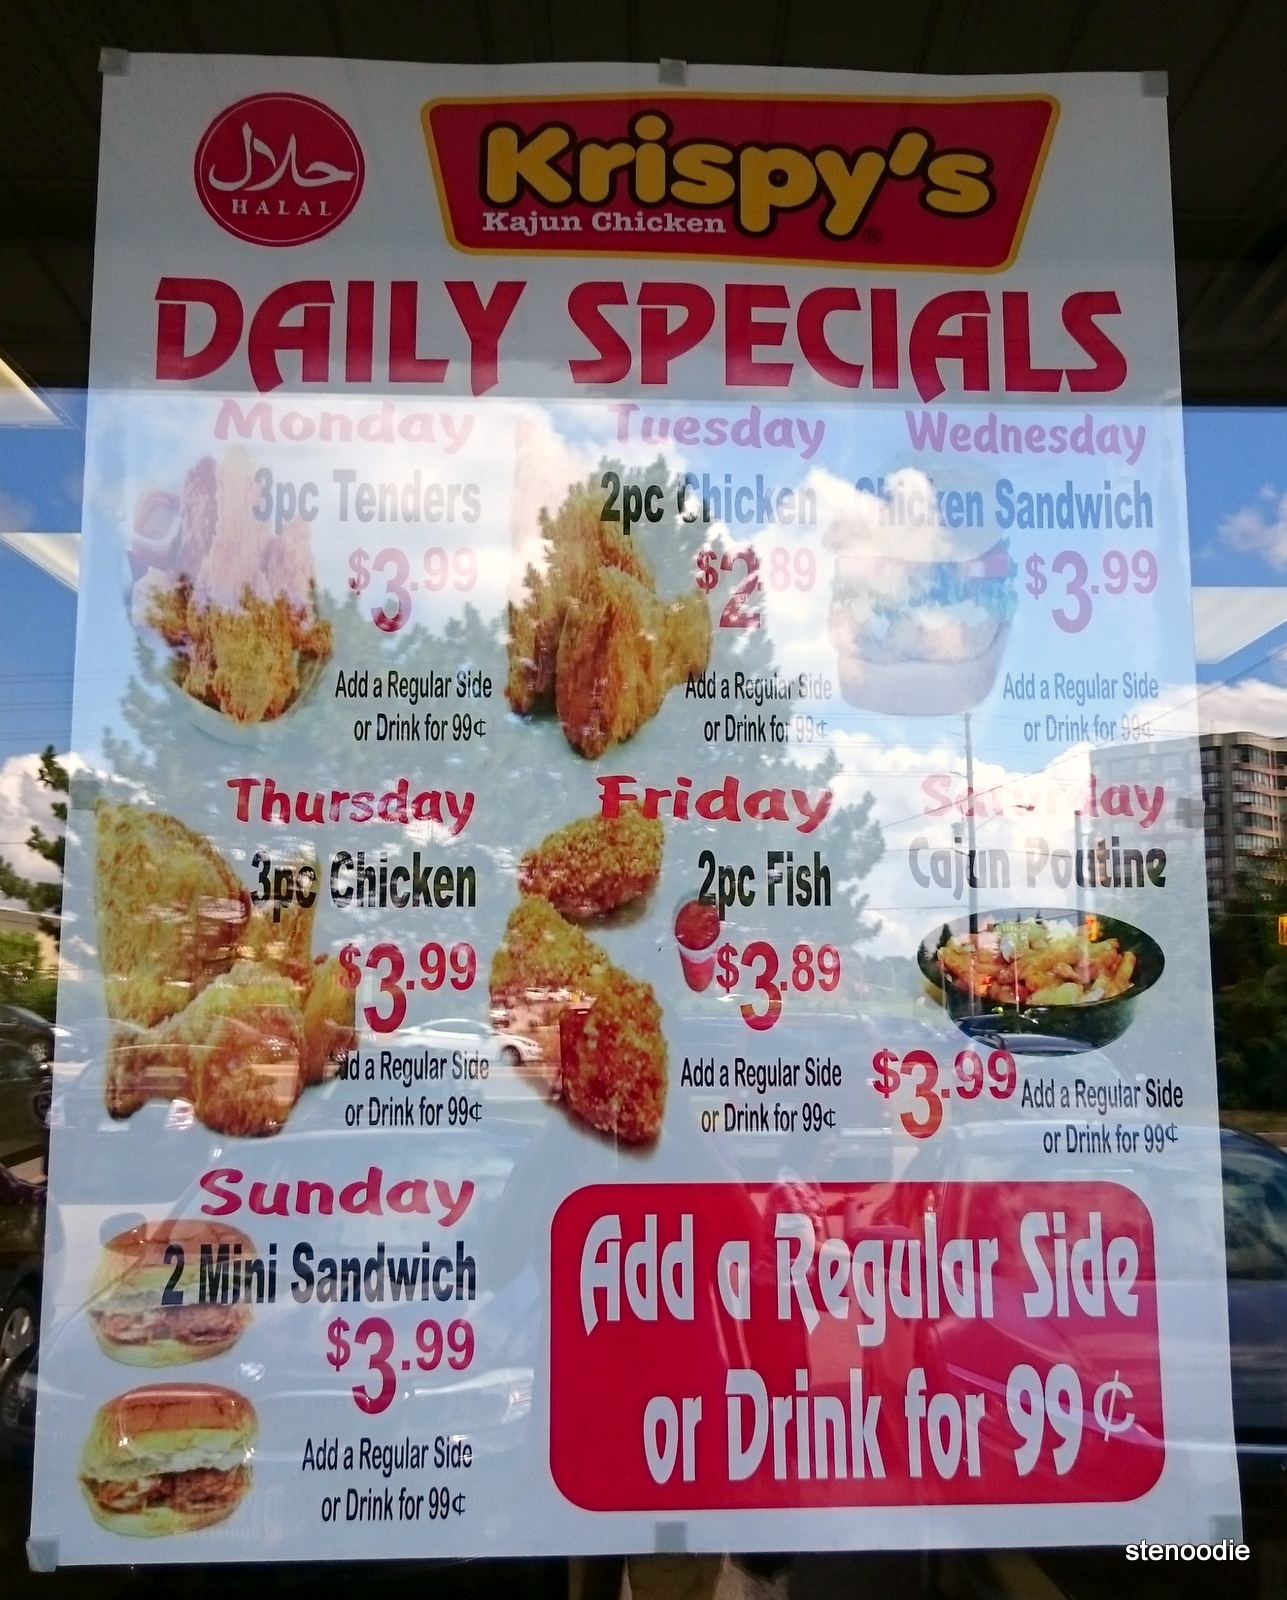 Krispy's Kajun Chicken Daily Specials